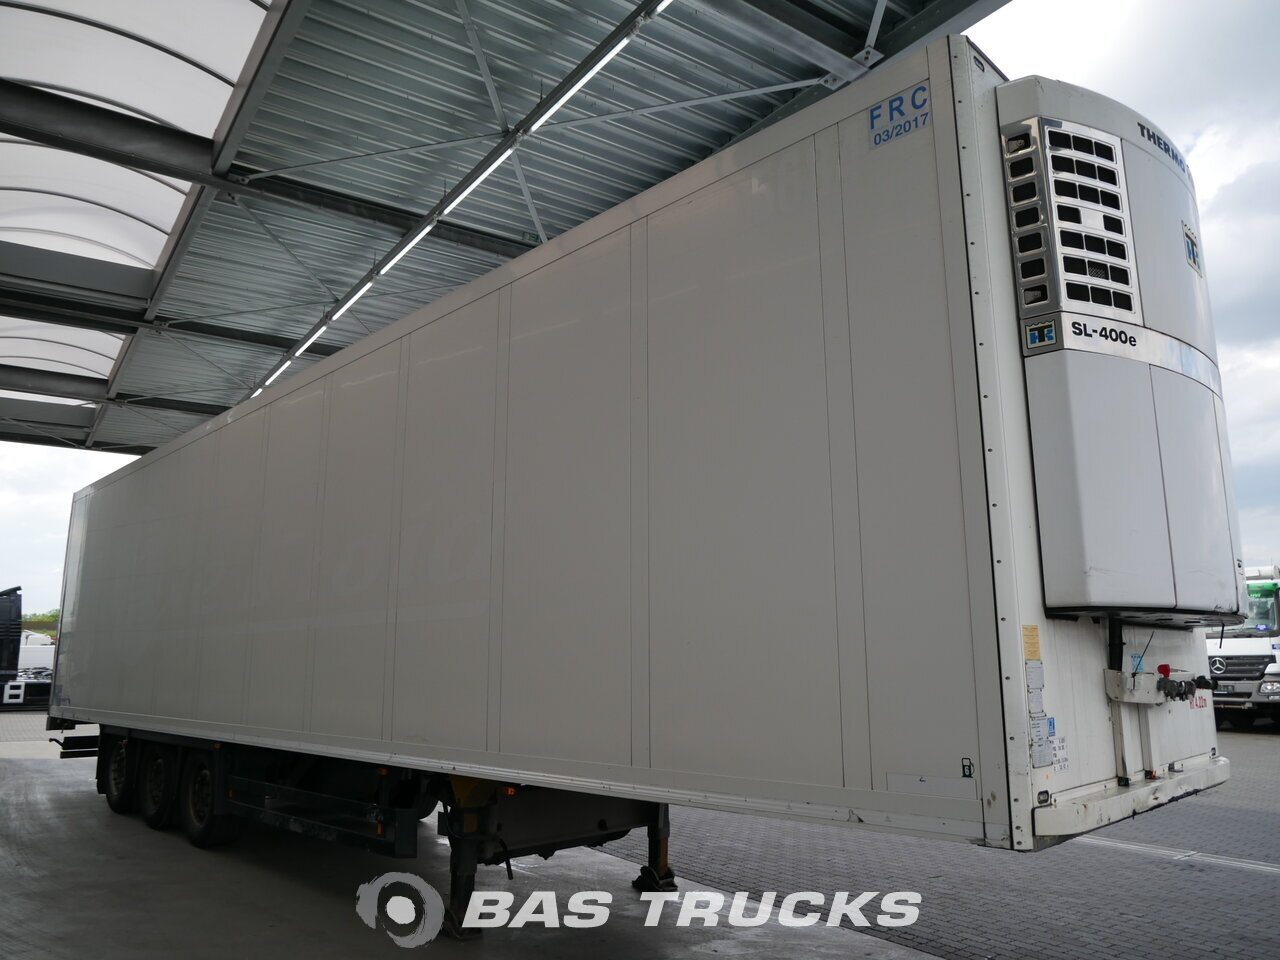 schmitz s3 doppelstock auflieger 12800 bas trucks. Black Bedroom Furniture Sets. Home Design Ideas